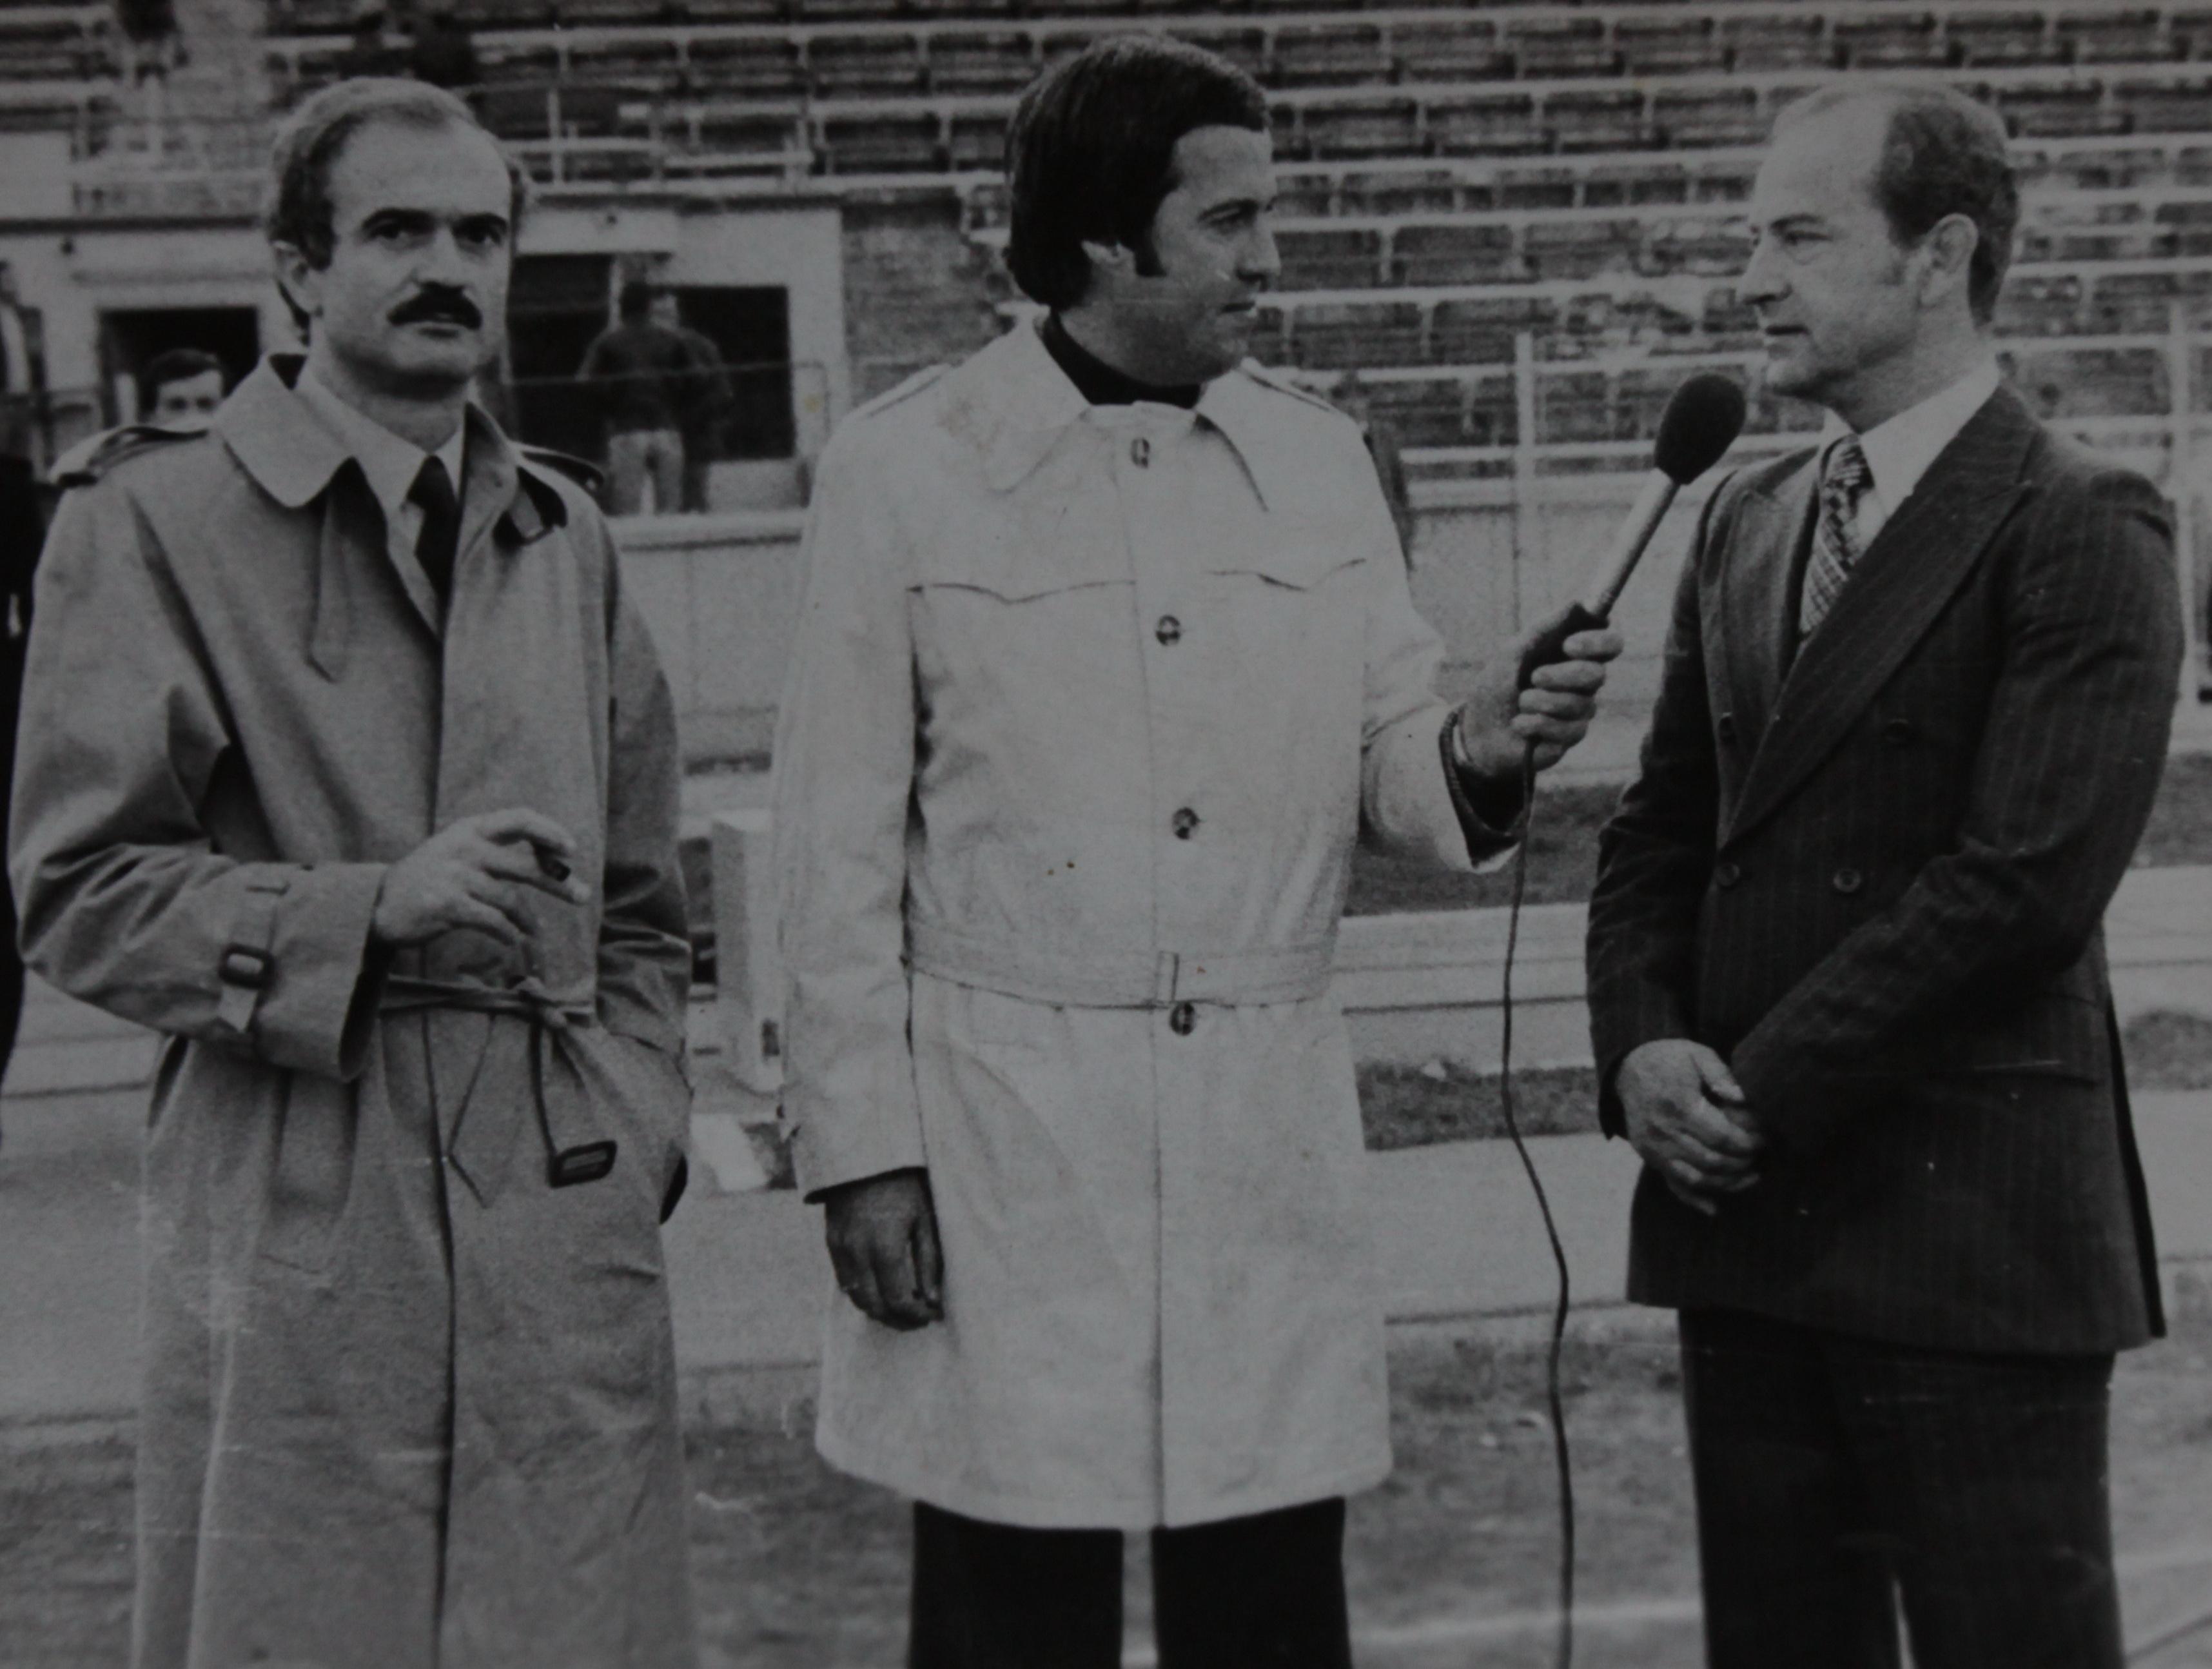 Vasile Anghel ofera un interviu dupa victoria lui Dinamo in fata lui Inter MIlano (1981). Langa el este marele Sandro Mazzola